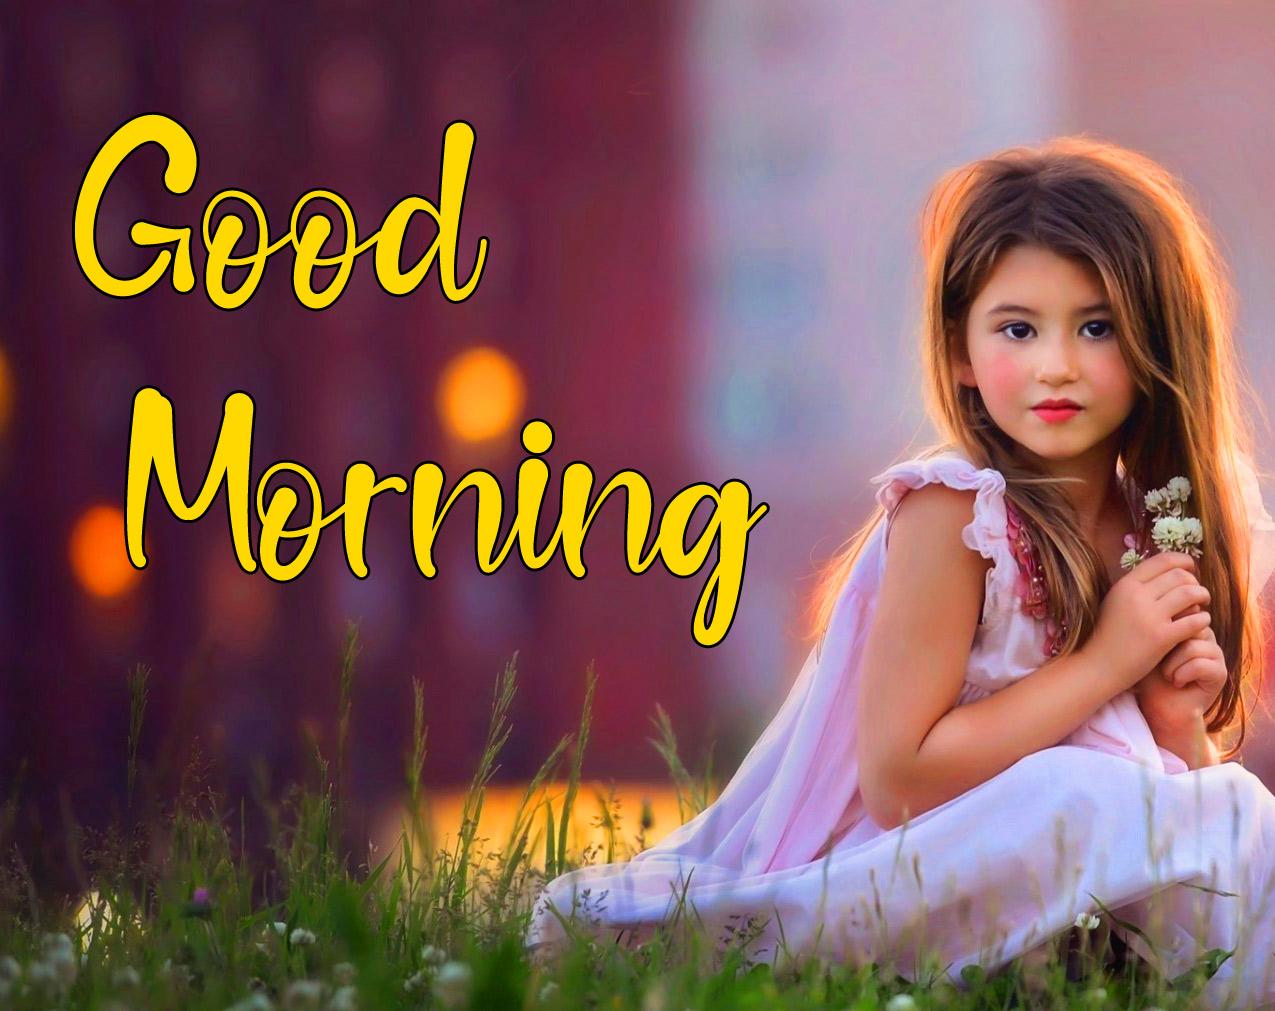 good morning Images for girls 3